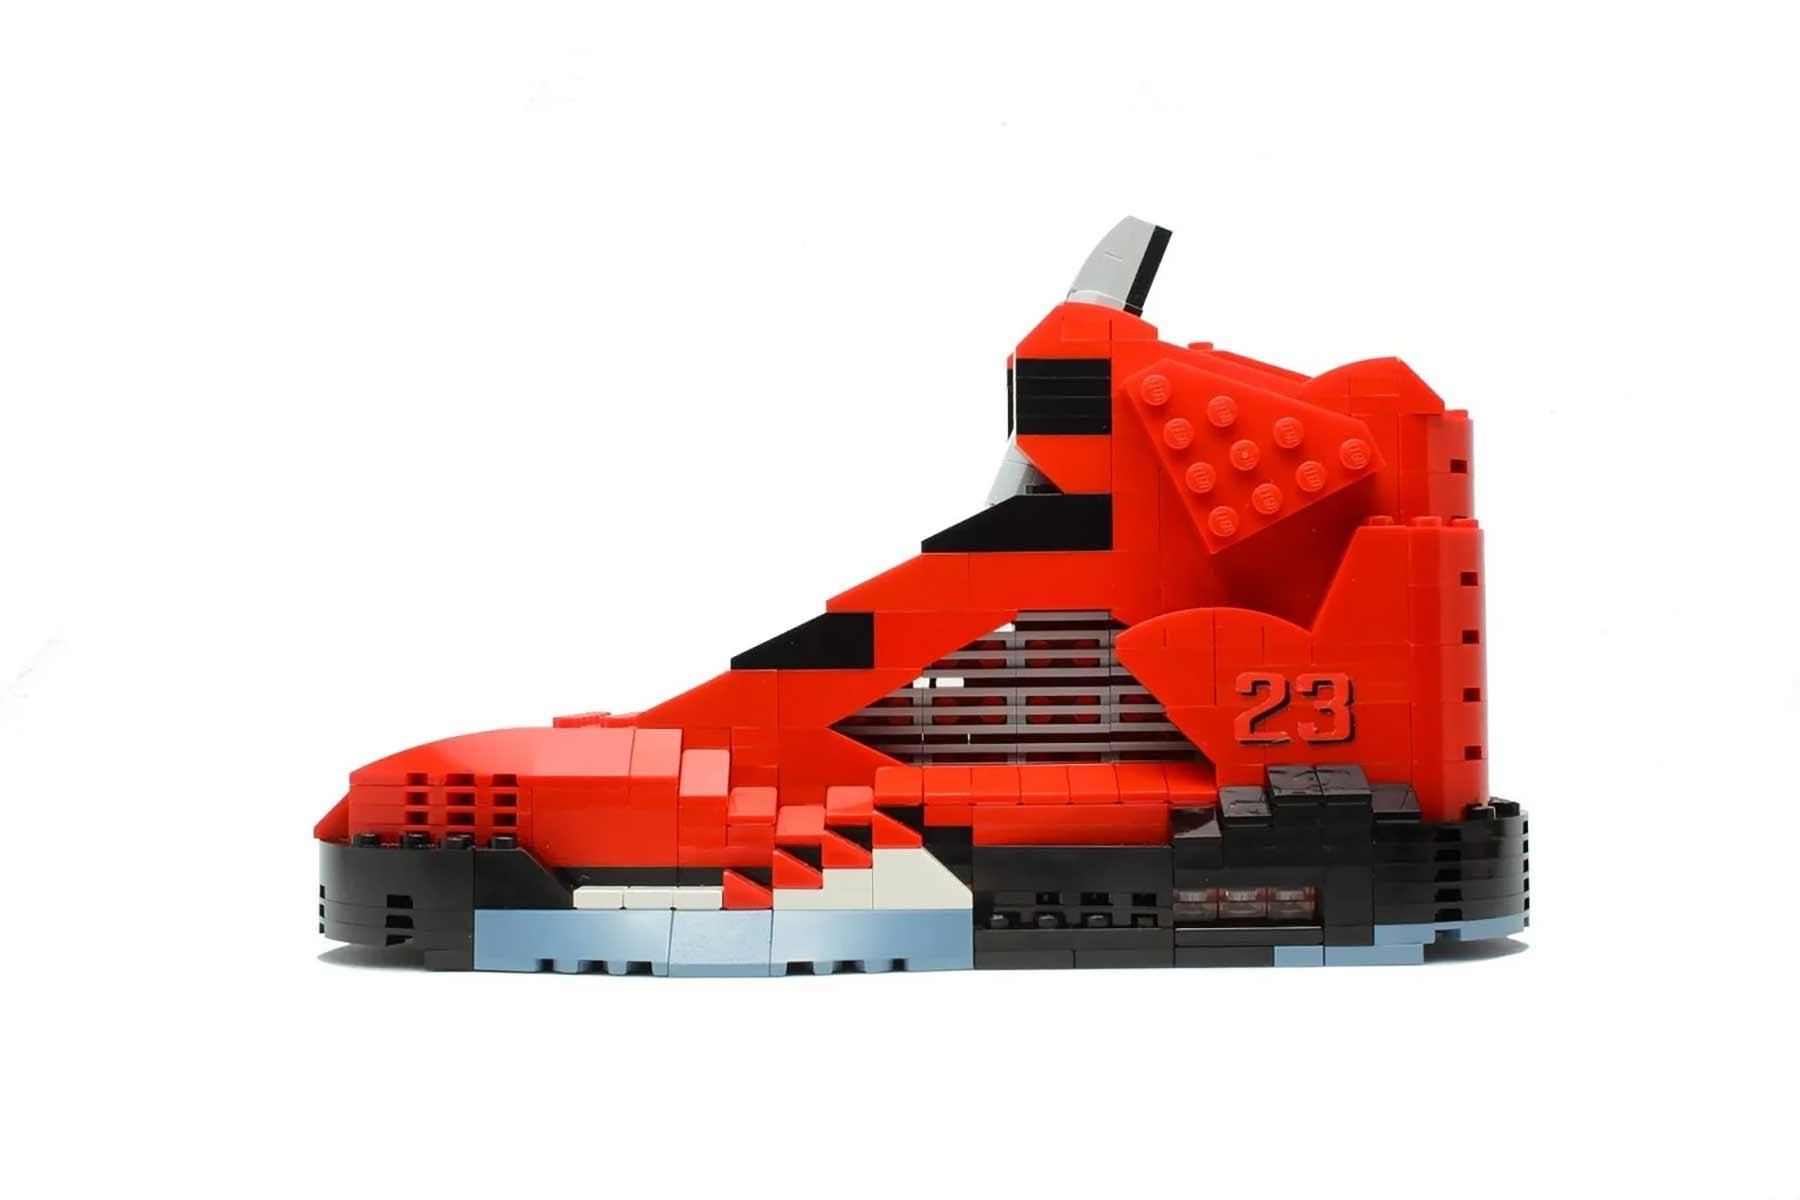 LEGO-Sneaker von Tom Yoo LEGO-Sneaker-Tom-Yoo_05